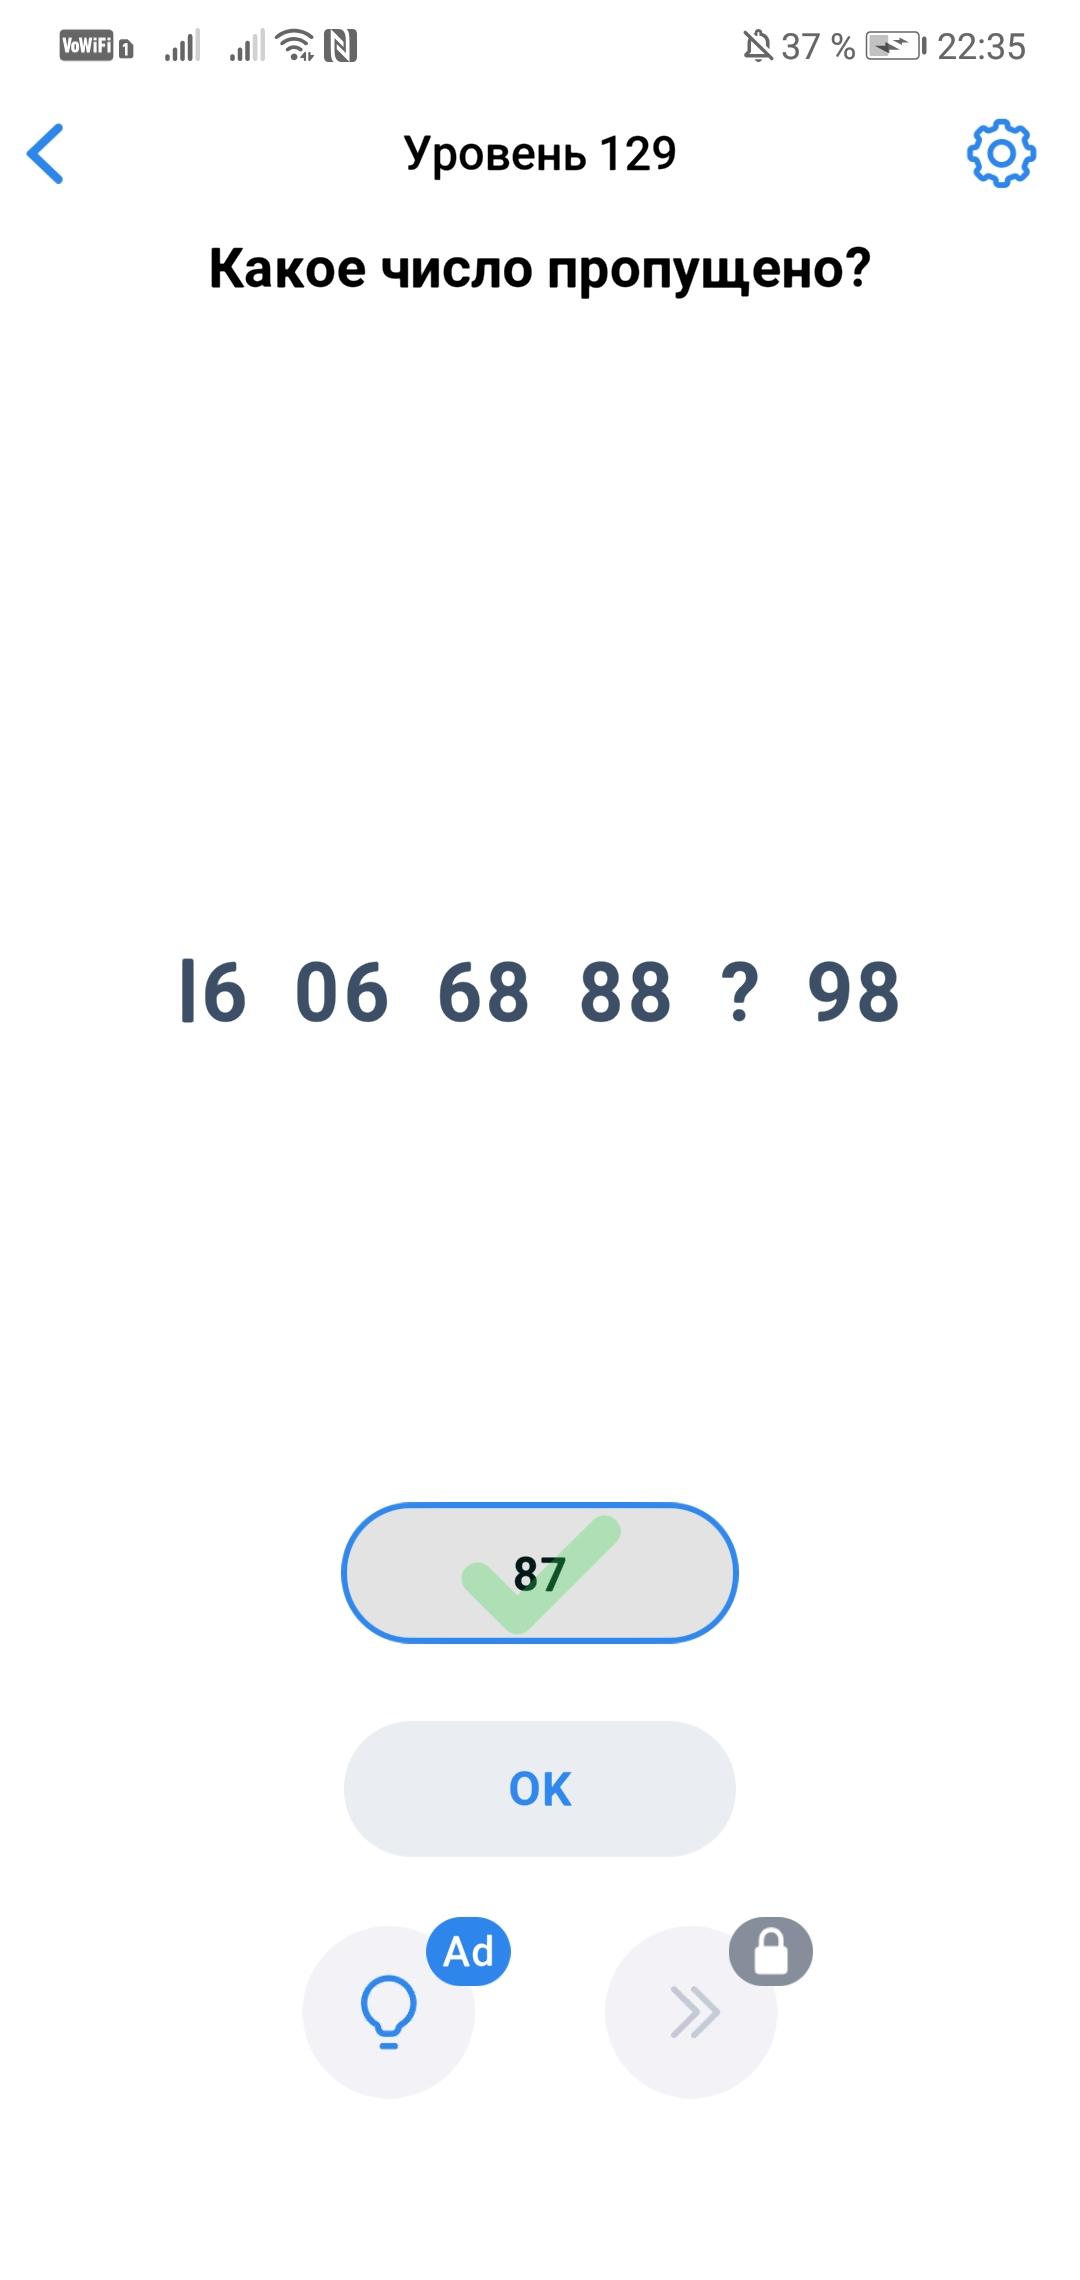 Easy Game - 129 уровень - Какое число пропущено?